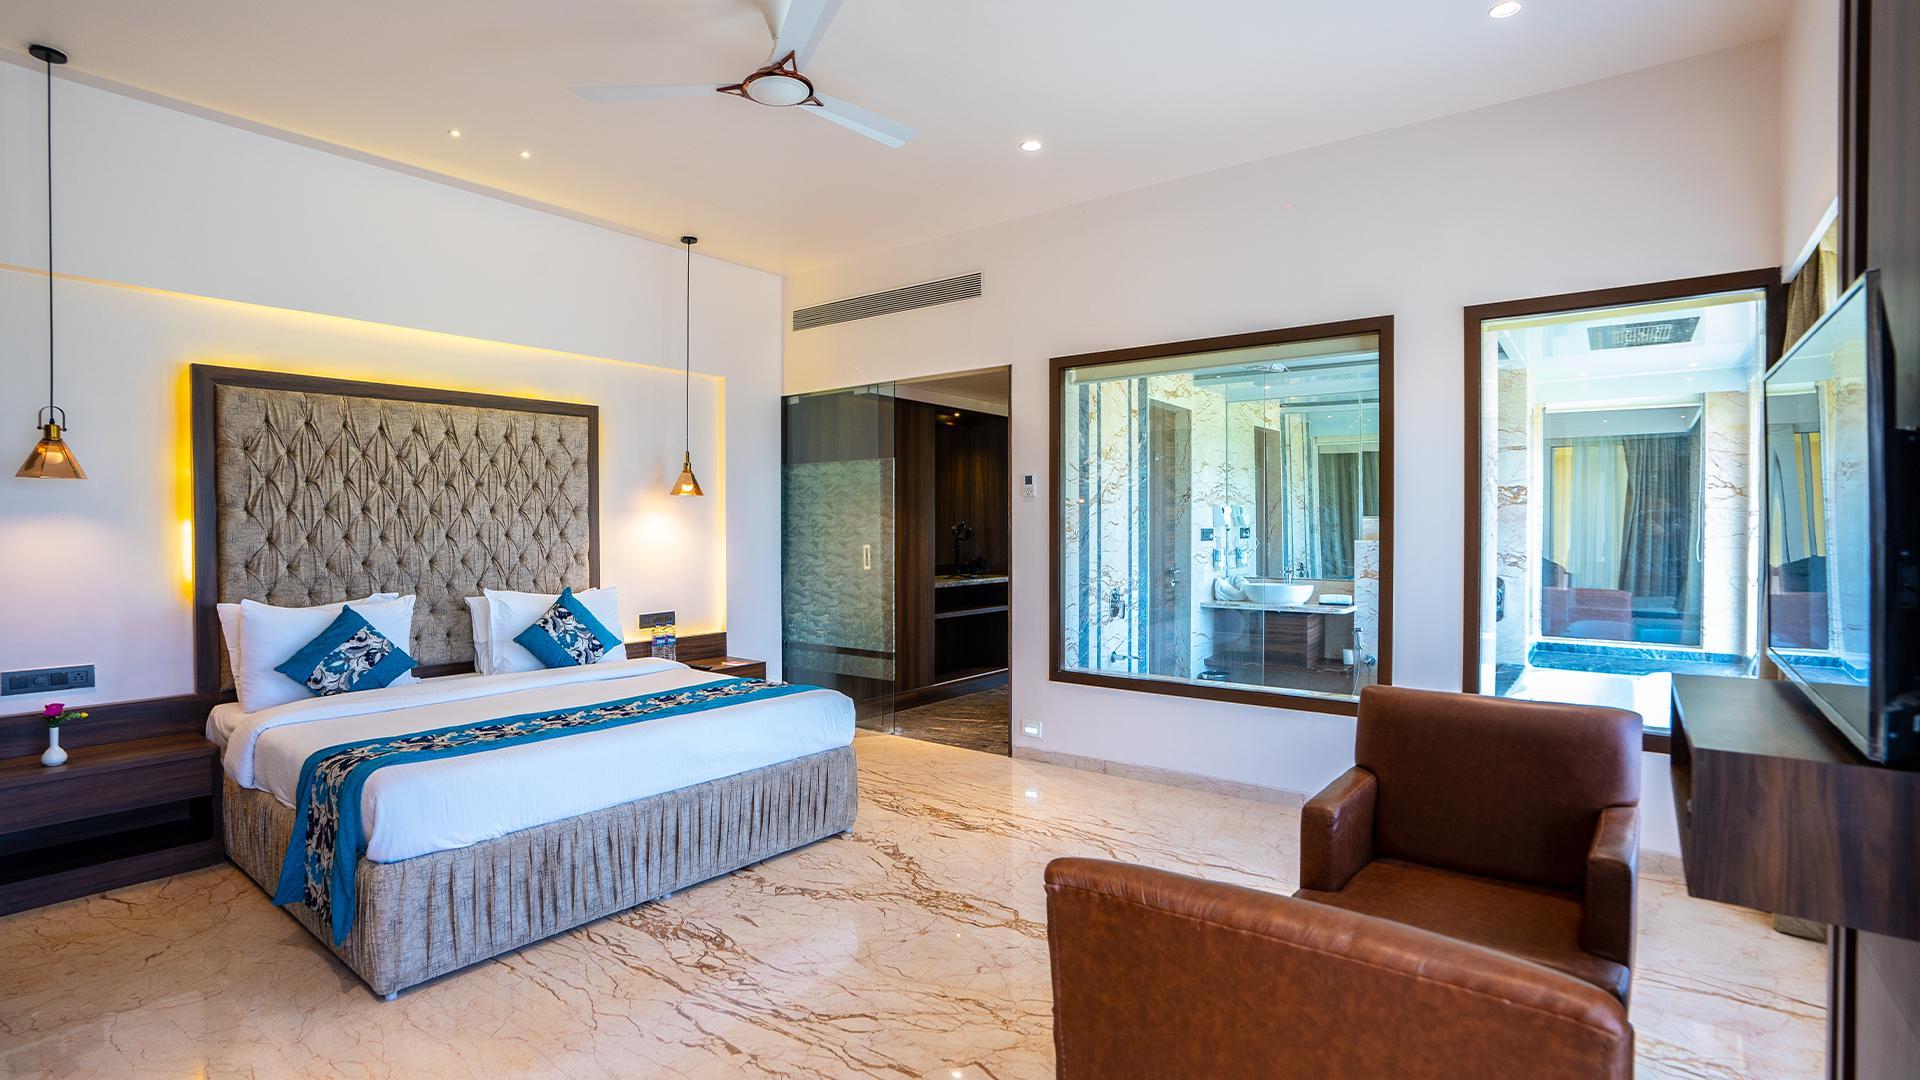 Suite image 1 at Tropical Retreat Luxury Resort & Spa by Nashik, Maharashtra, India